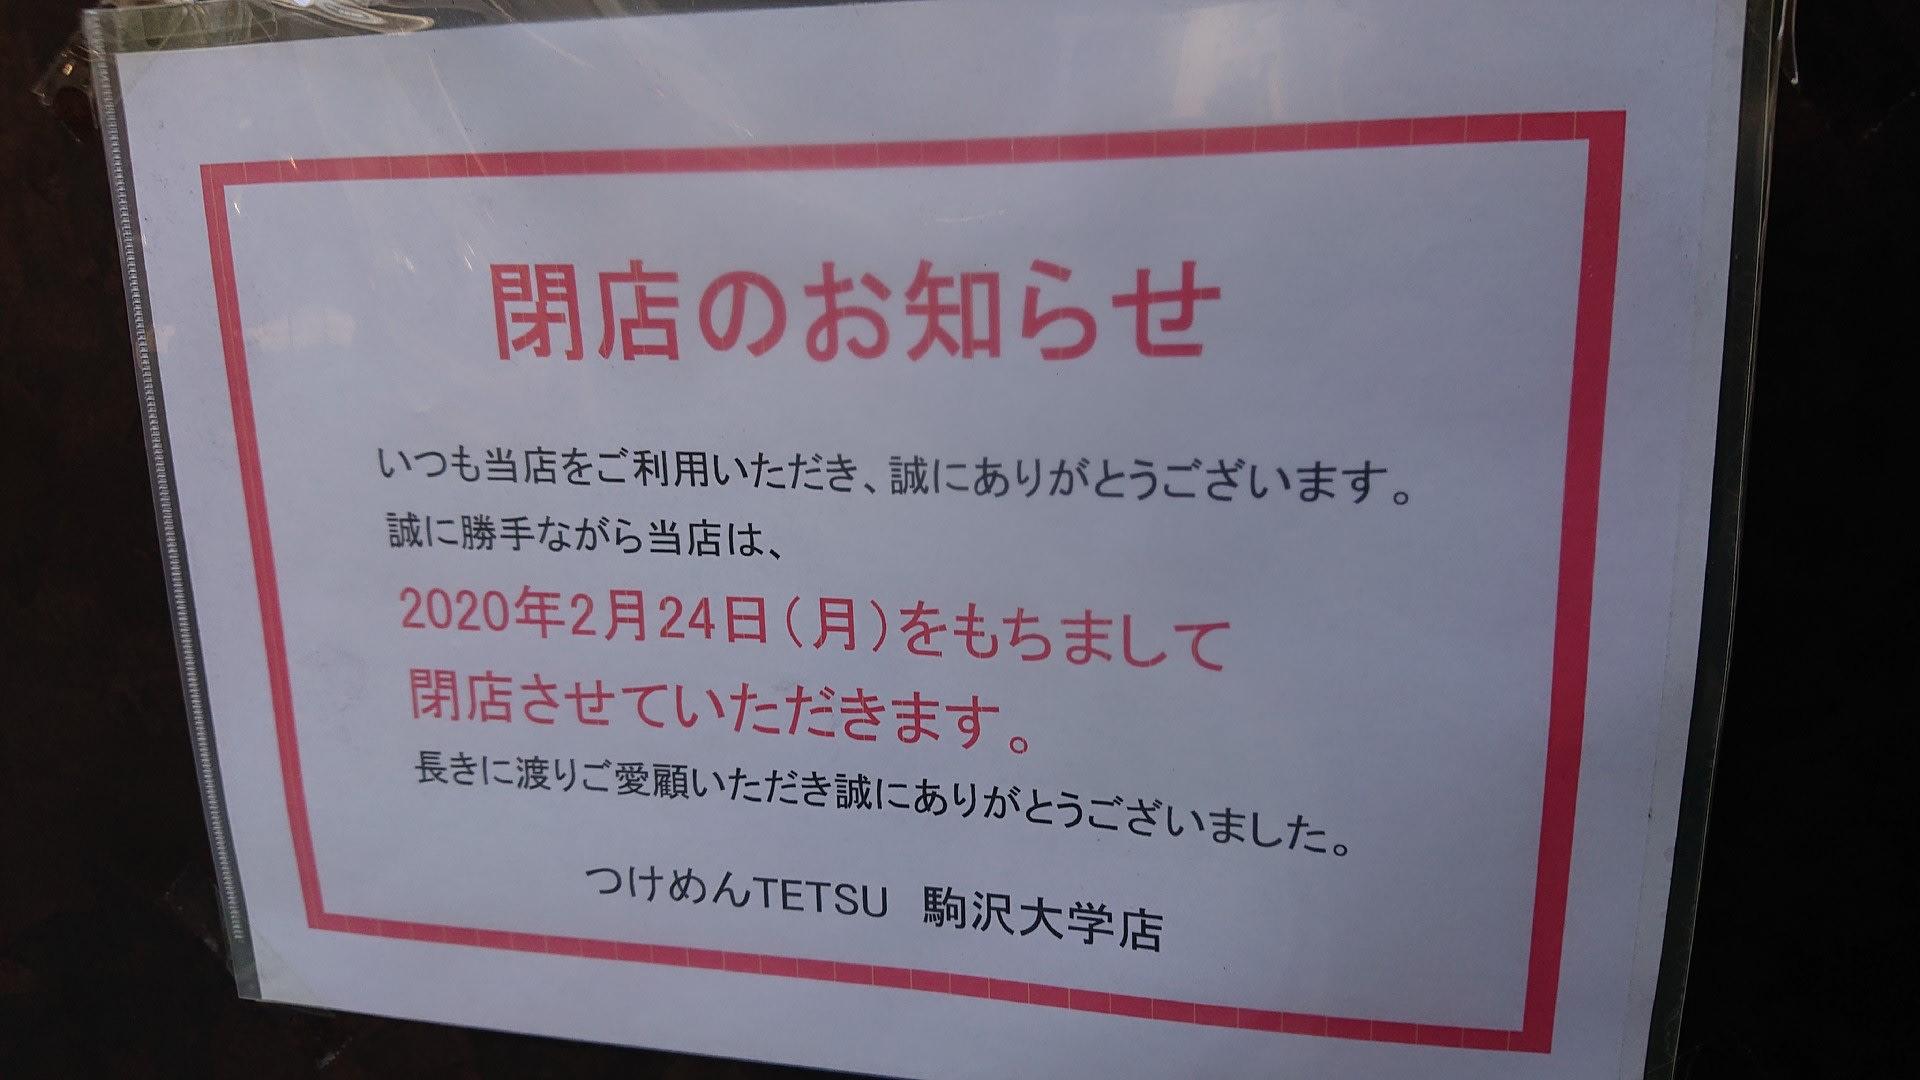 TETSU@駒澤大学